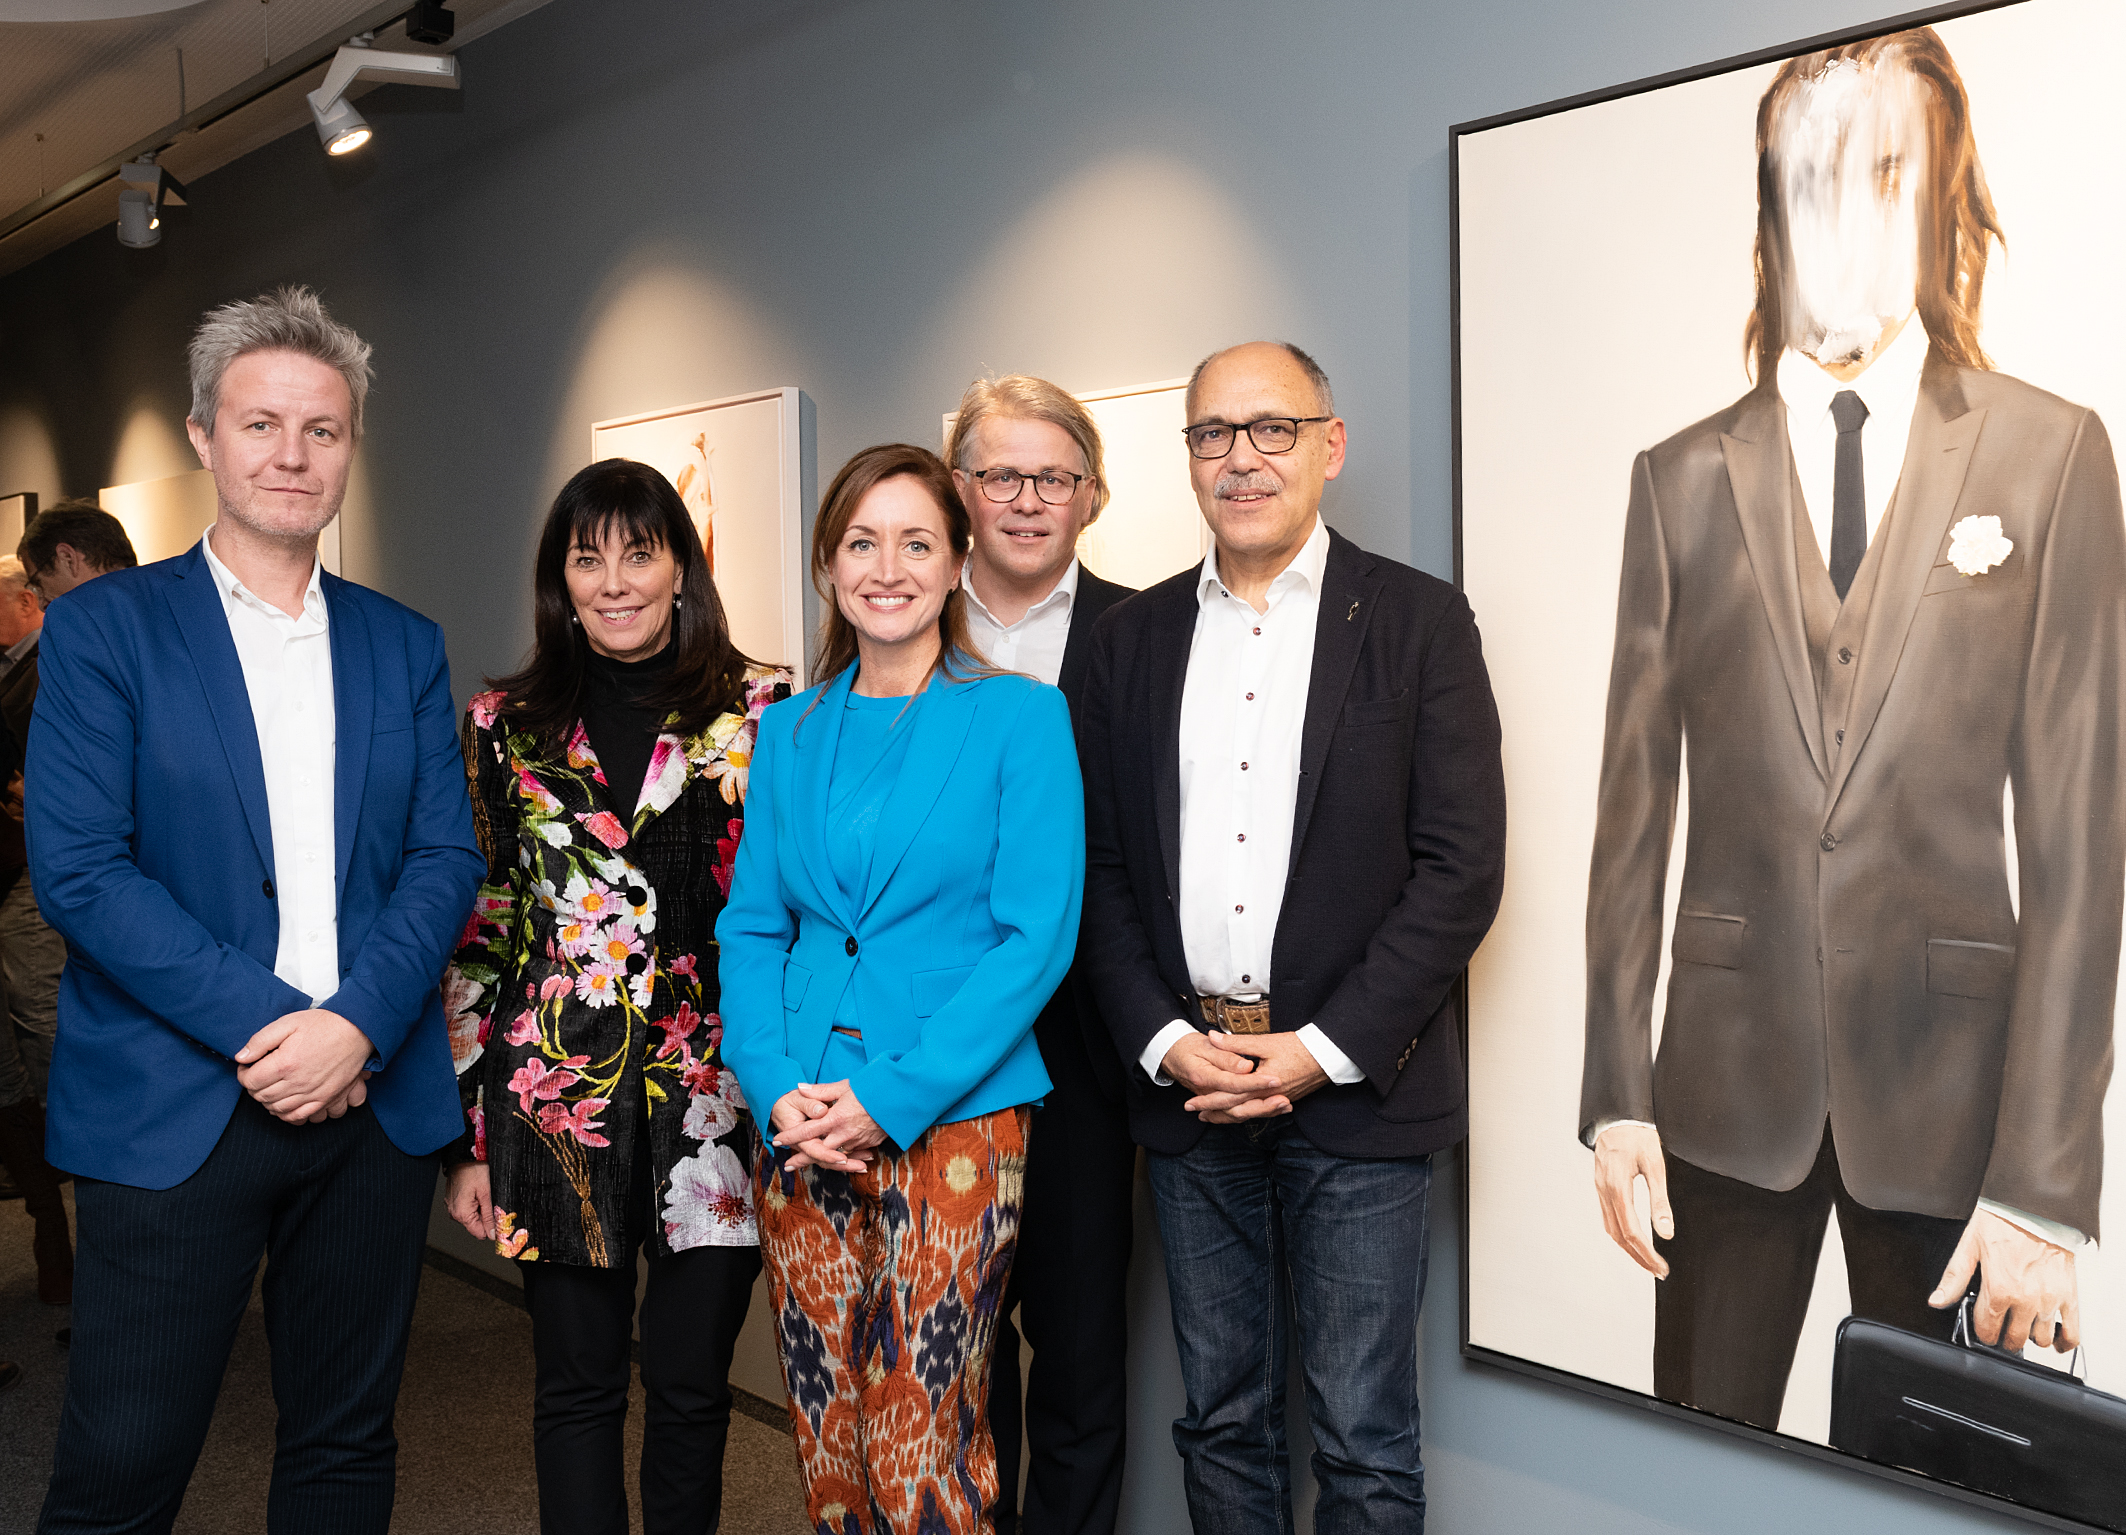 v.li. Thomas Riess, Martha Schultz, Julia Sparber-Ablinger, Martin Terzer, Hans Rudi Fischer.jpg